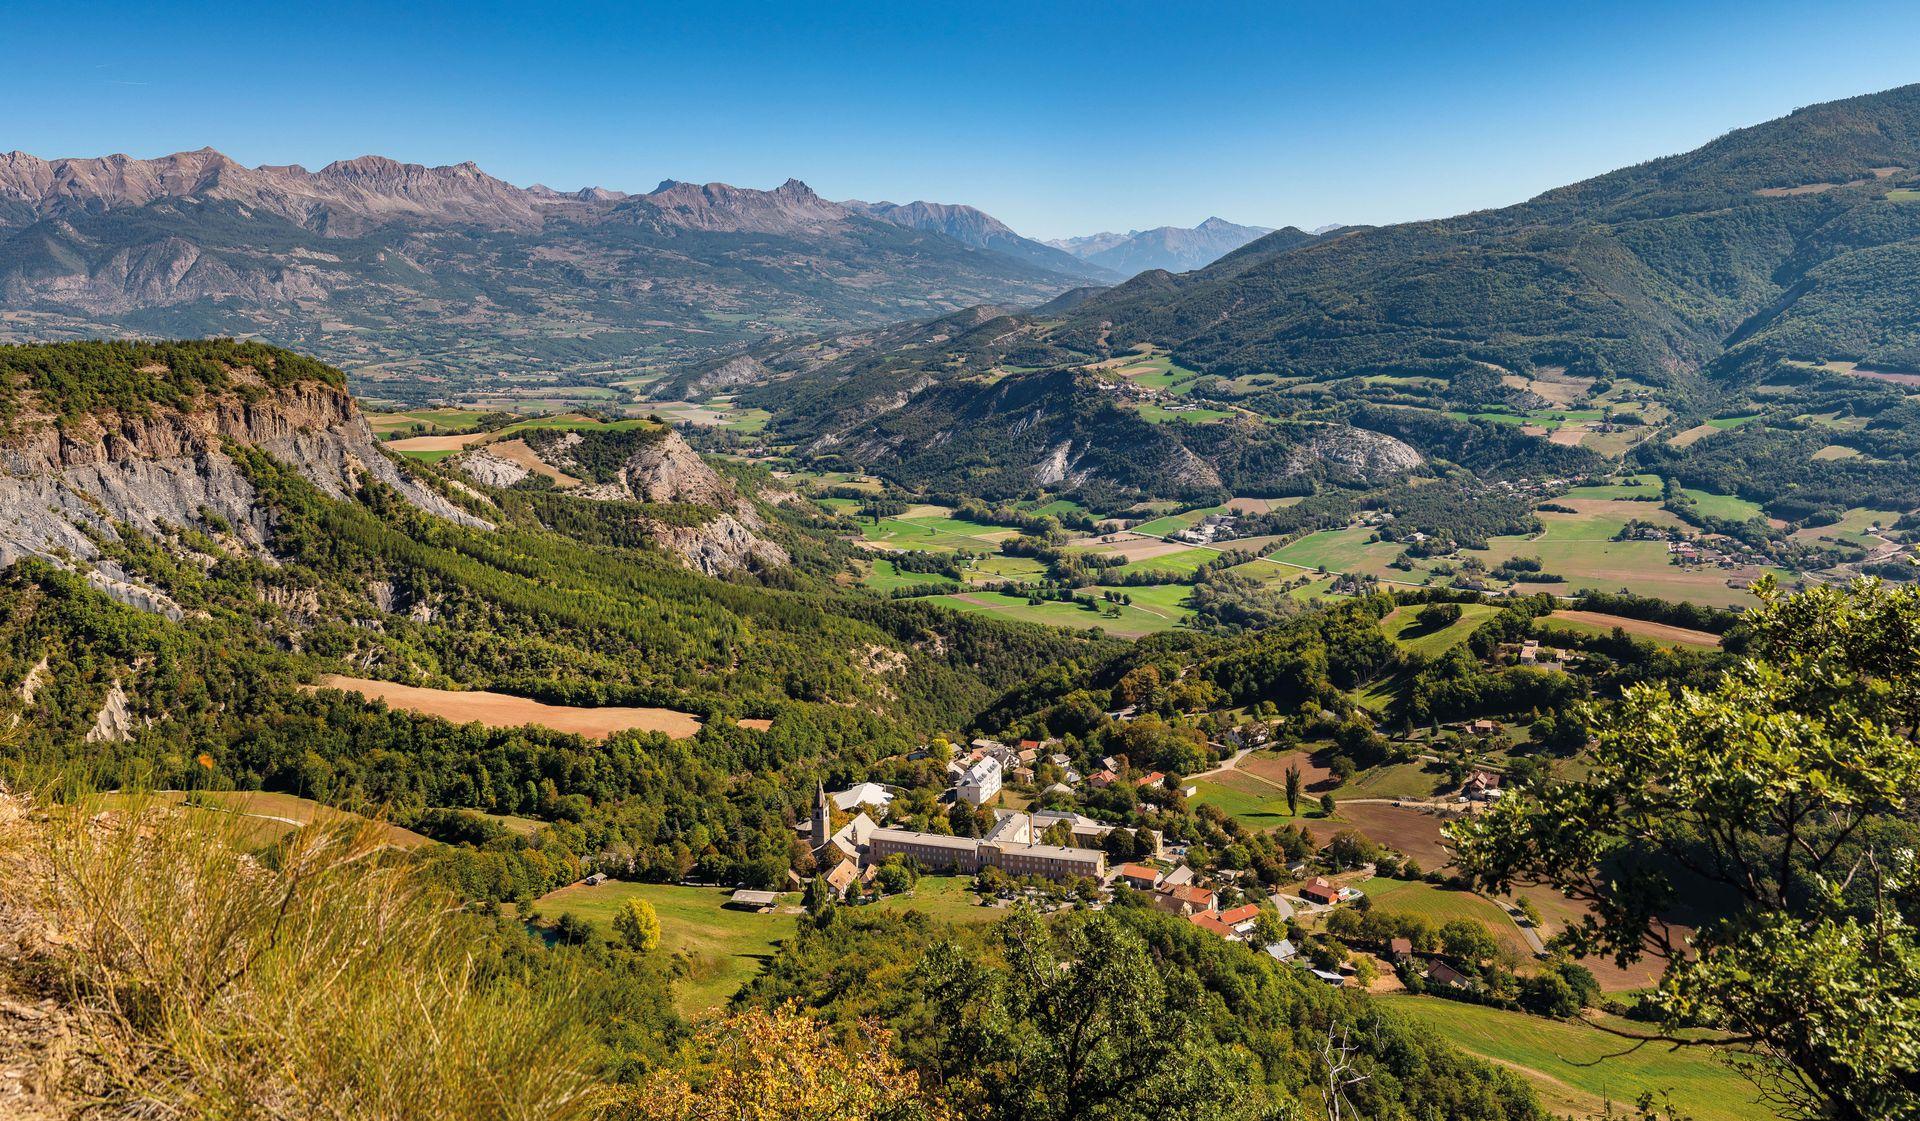 Vallée de l'Avance